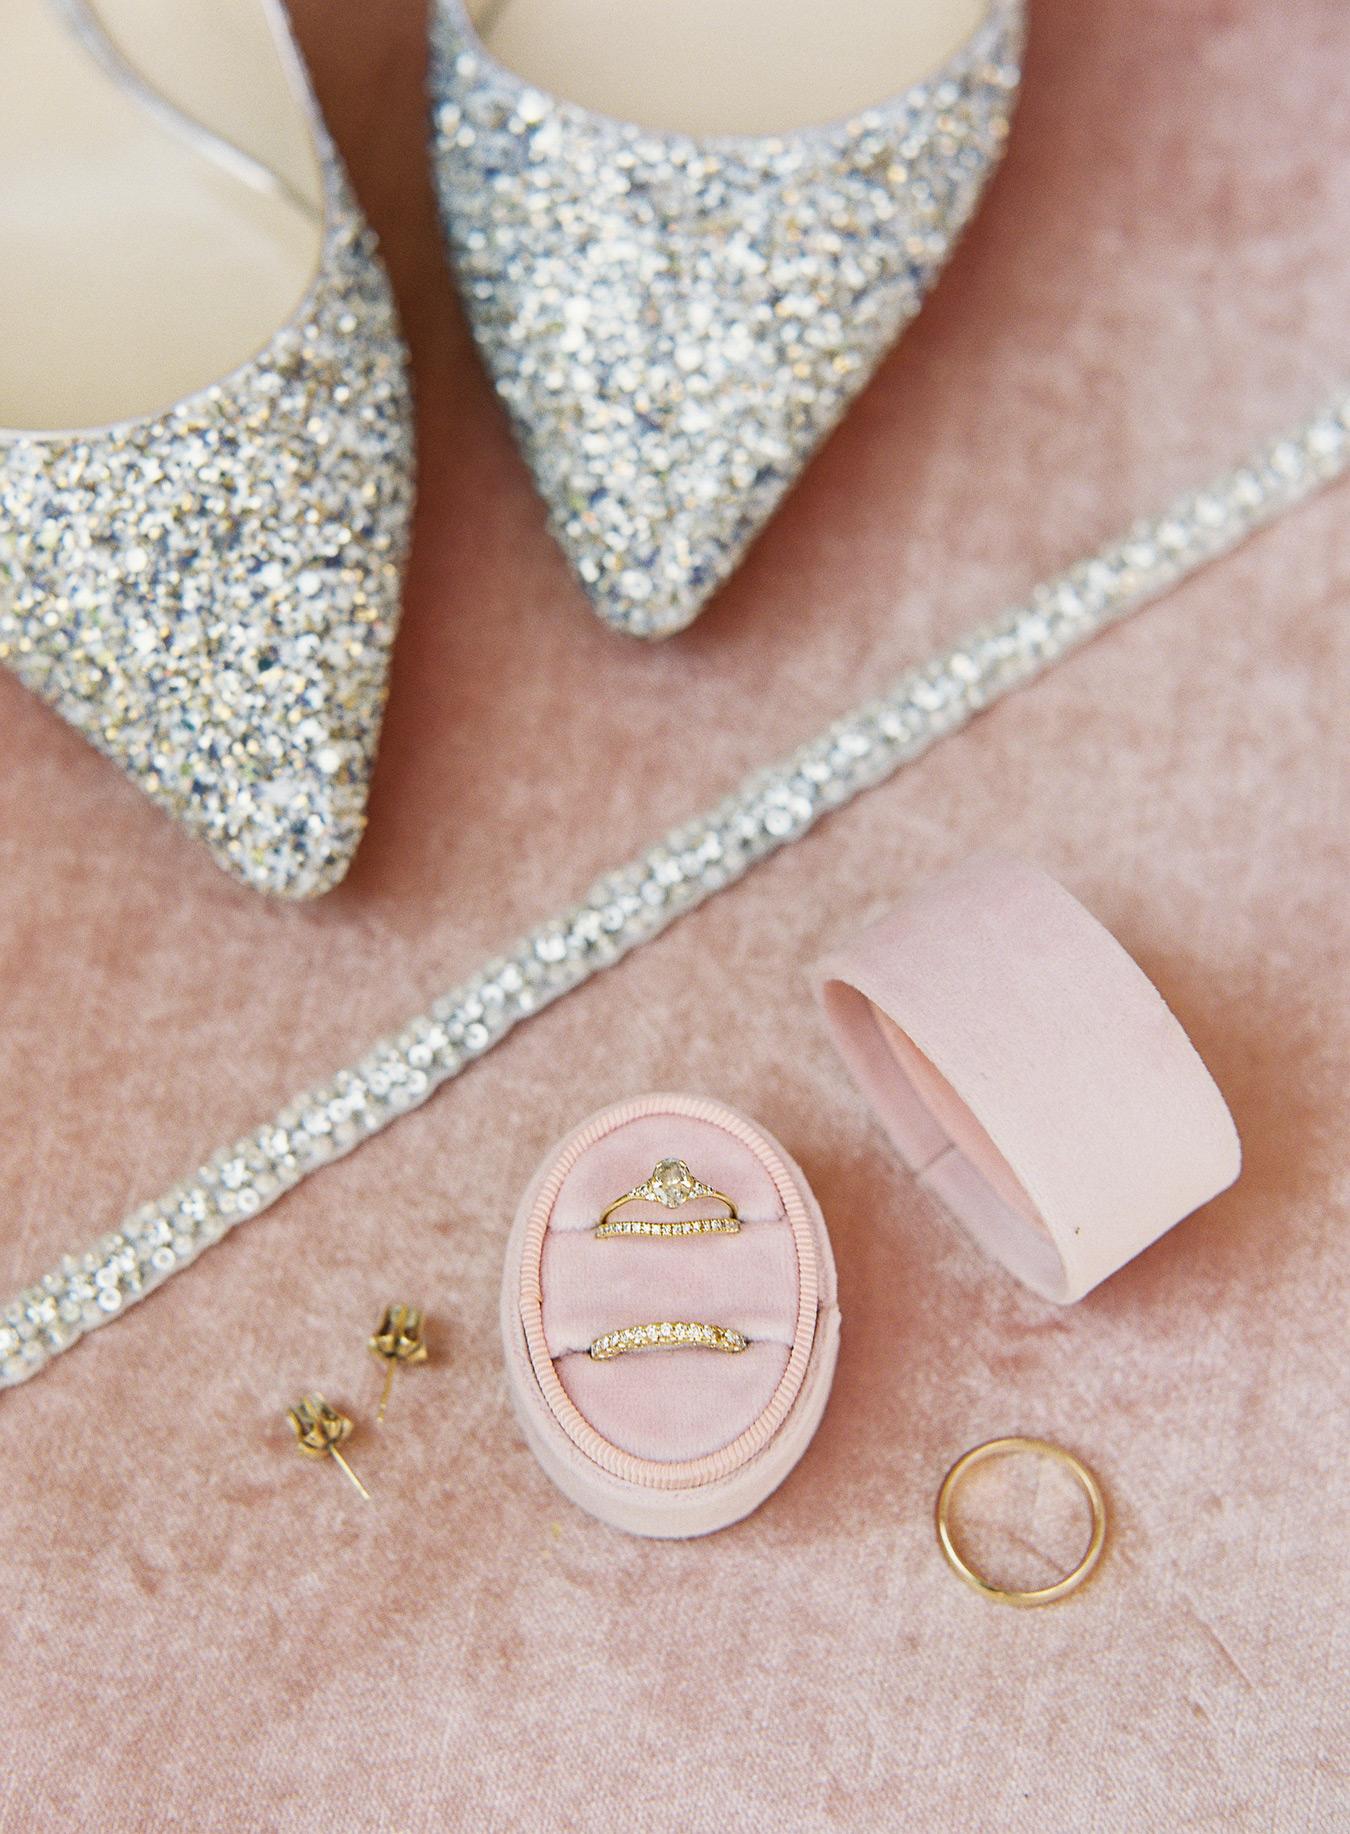 brides glittery shoes rings earrings